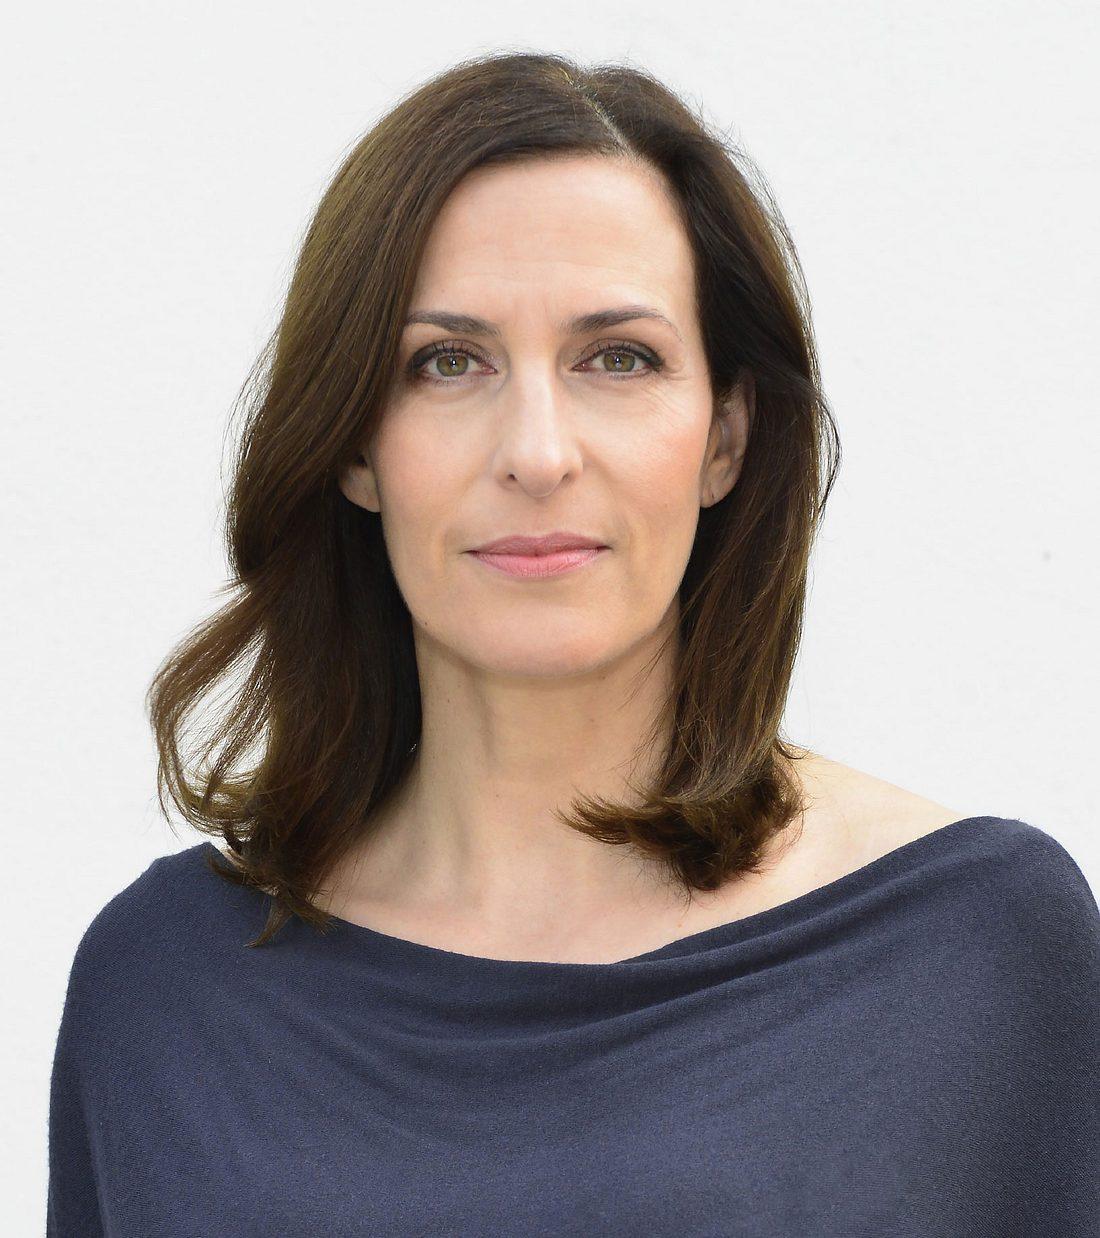 Steigt Ulrike Frank bei GZSZ aus?